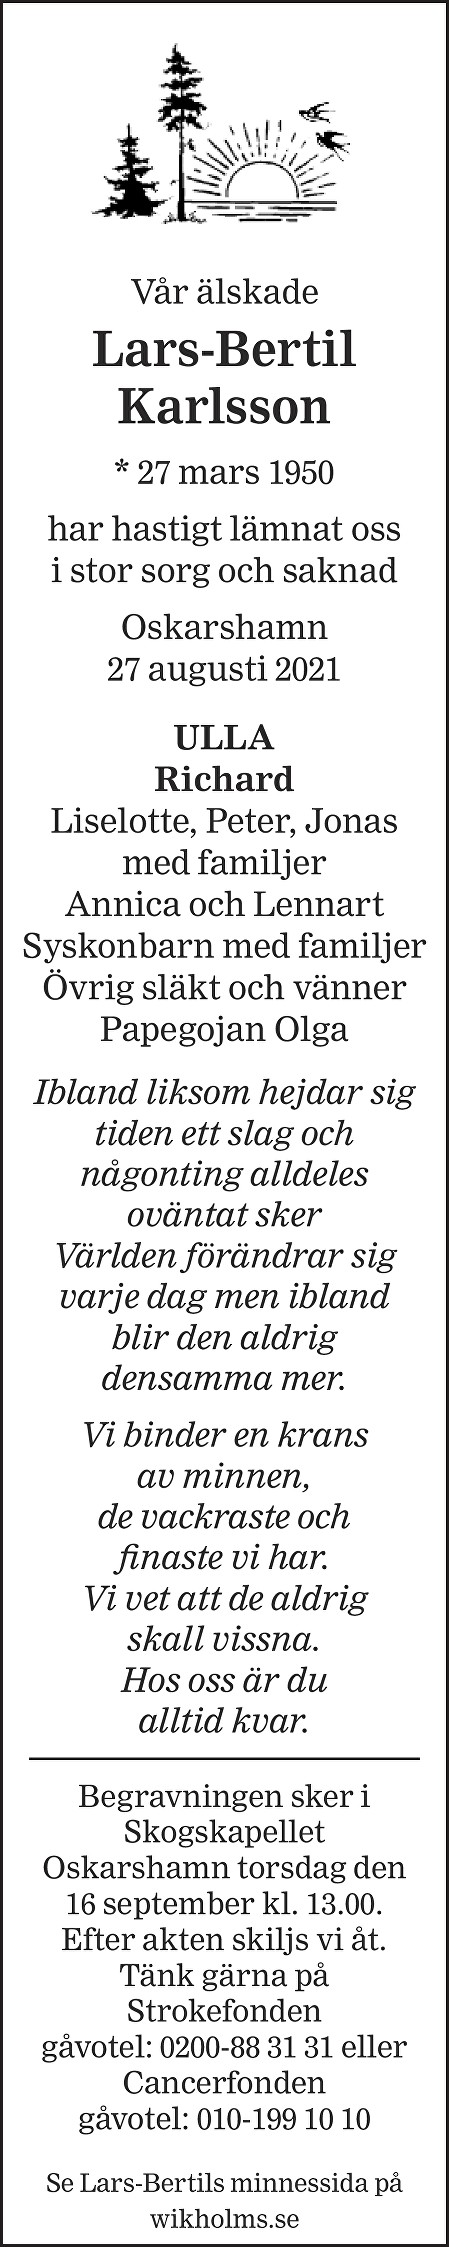 Lars-Bertil Karlsson Death notice